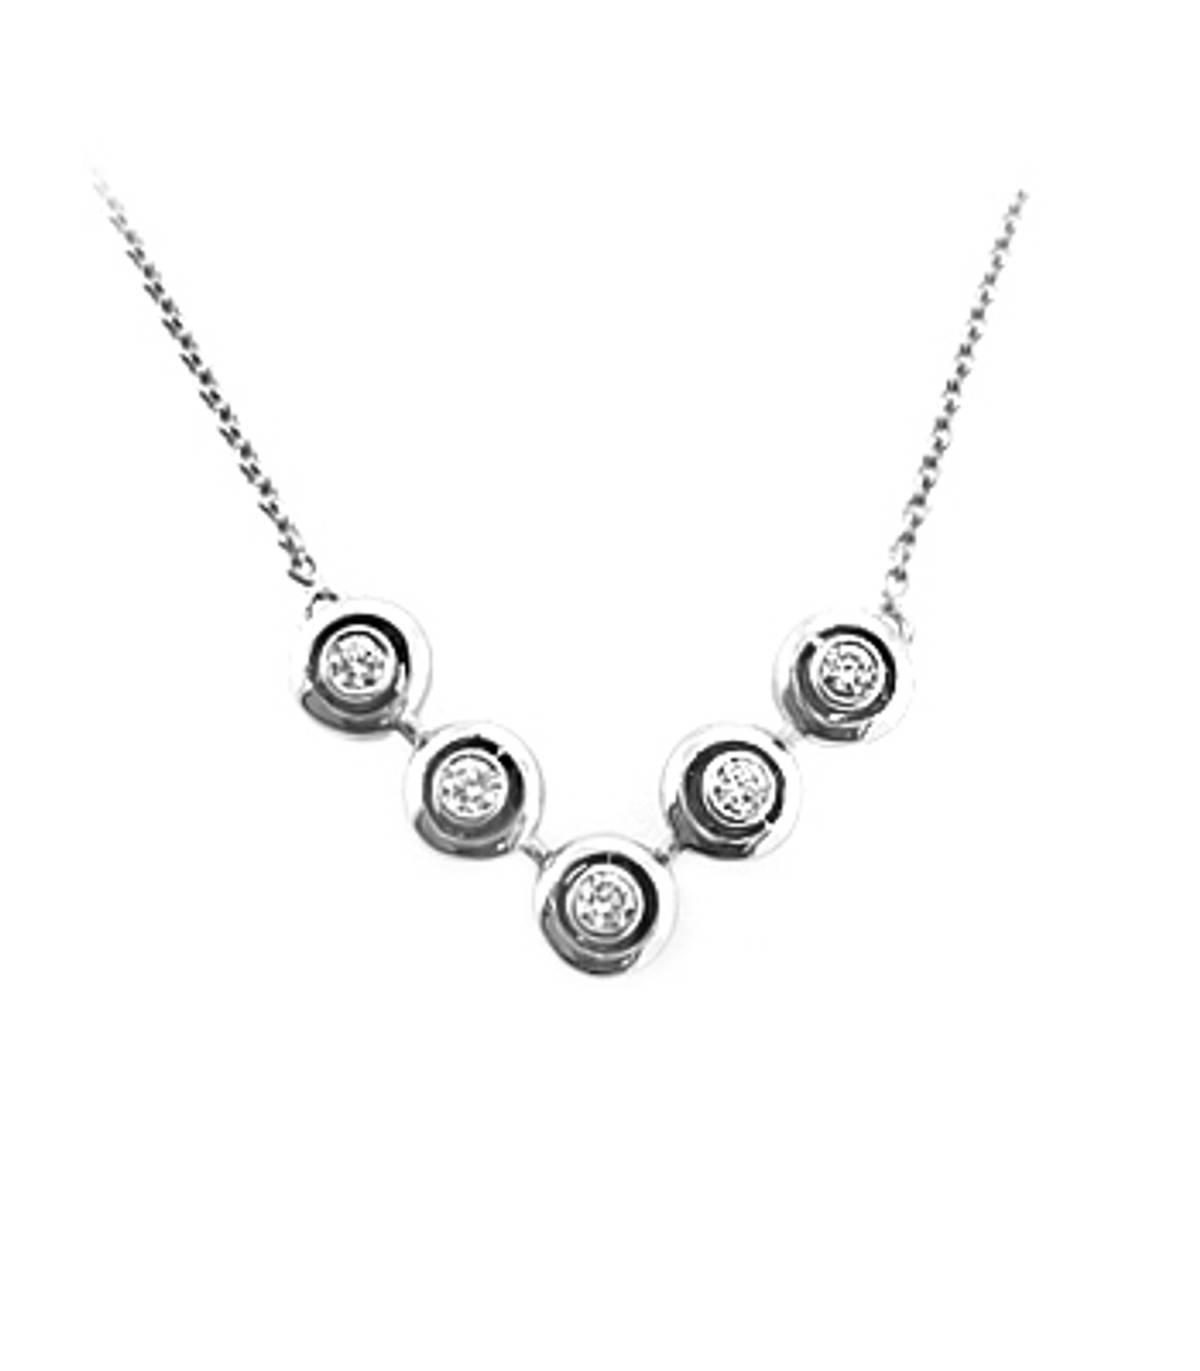 18k white gold 5st brilliant cut diamond rubover set necklaceDETAILSCarat: total diamond weight 0.22ctsCut: Brilliant cutMetal: 18k white gold SIZE & FITPendant length 1.4cmPendant width 2.4cmDrop  20cm